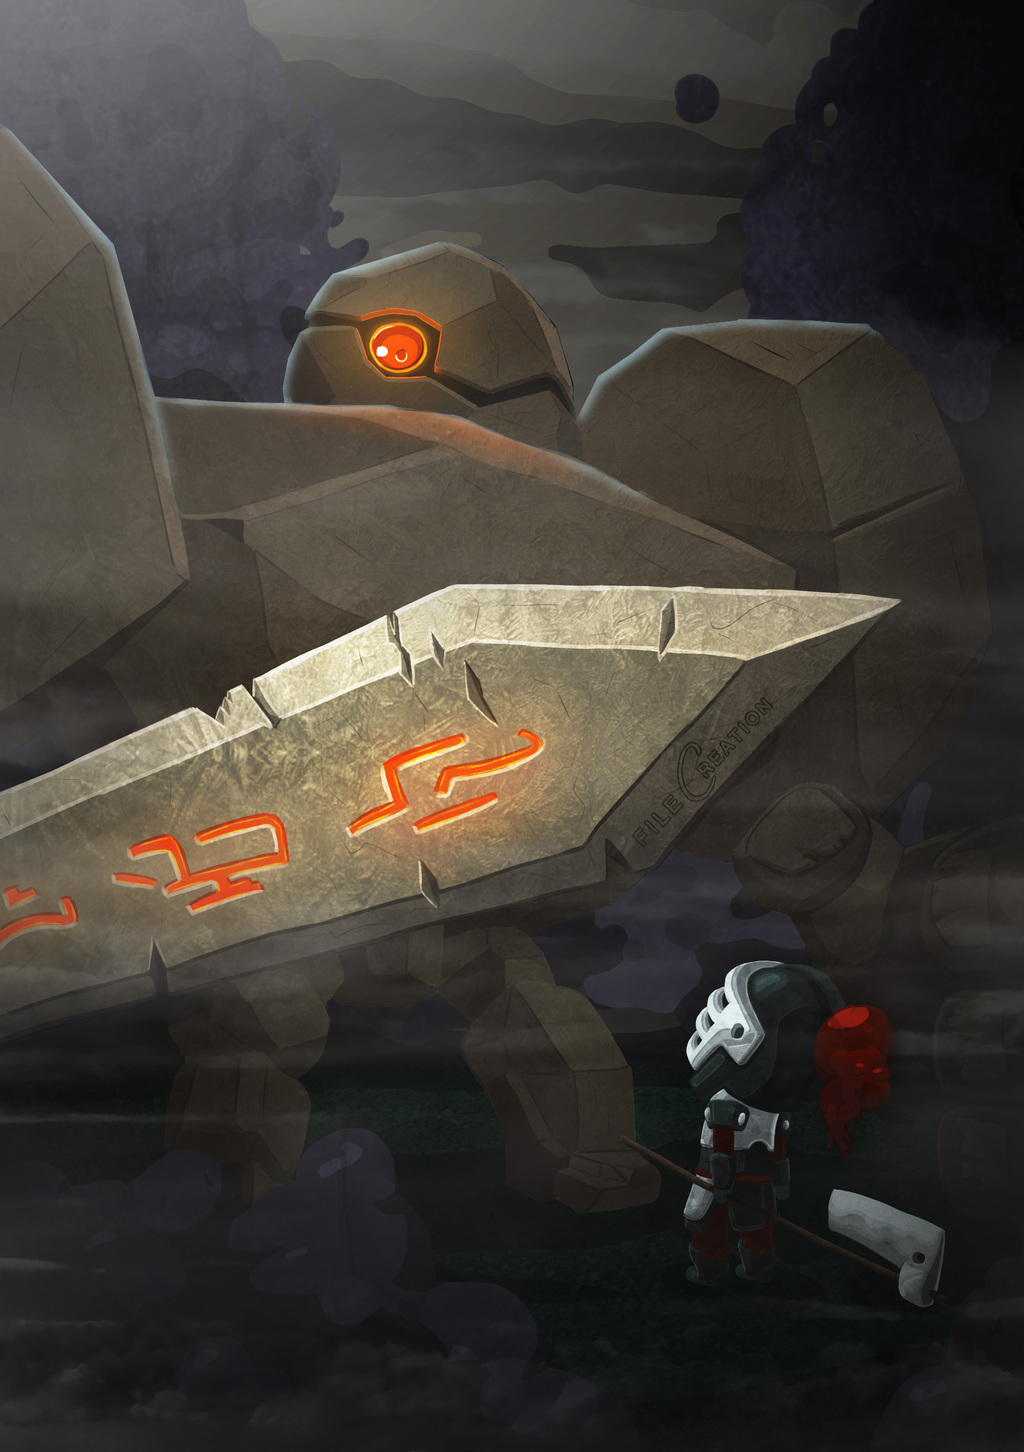 Most recent image: The Golem